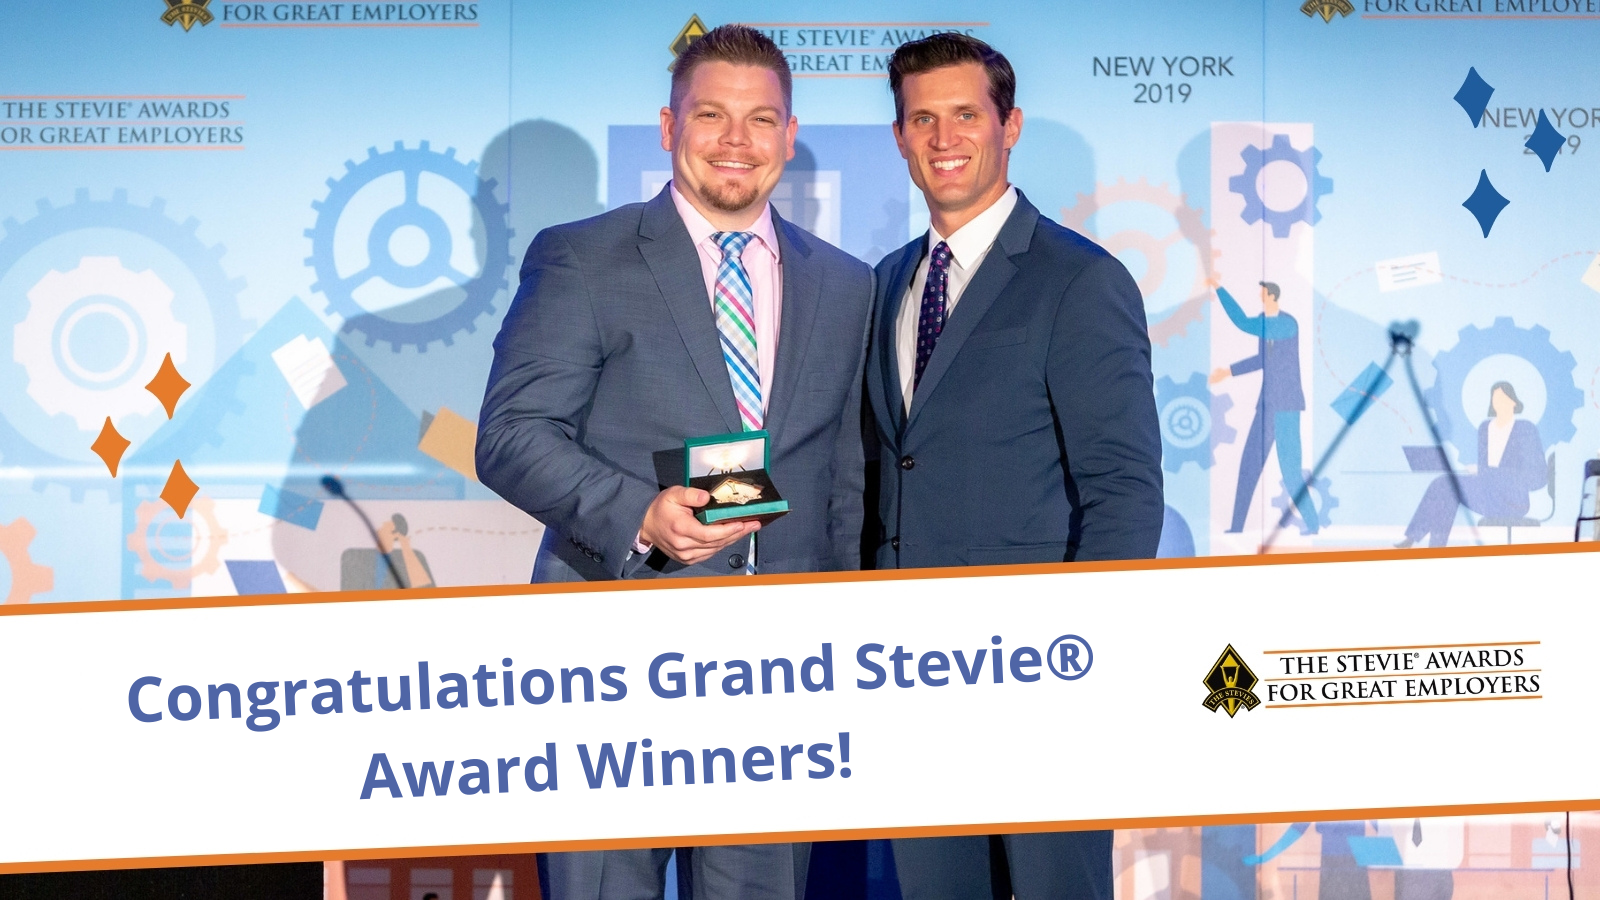 Congratulations Grand Stevie sage